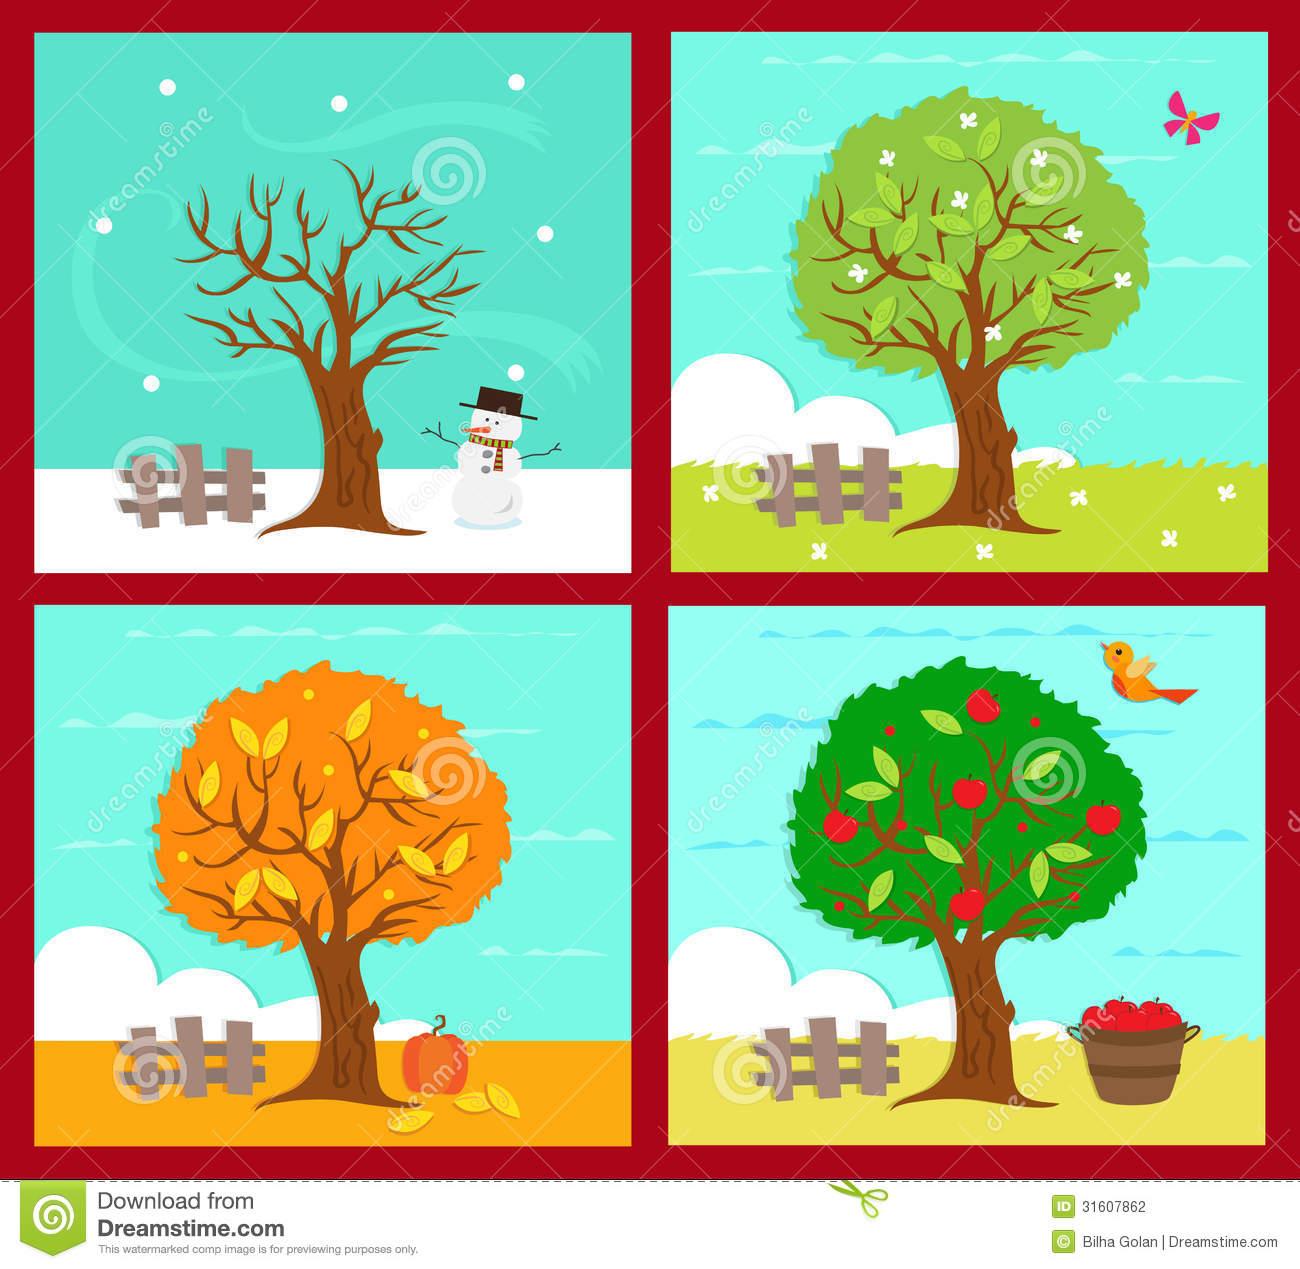 The four seasons clipart #10